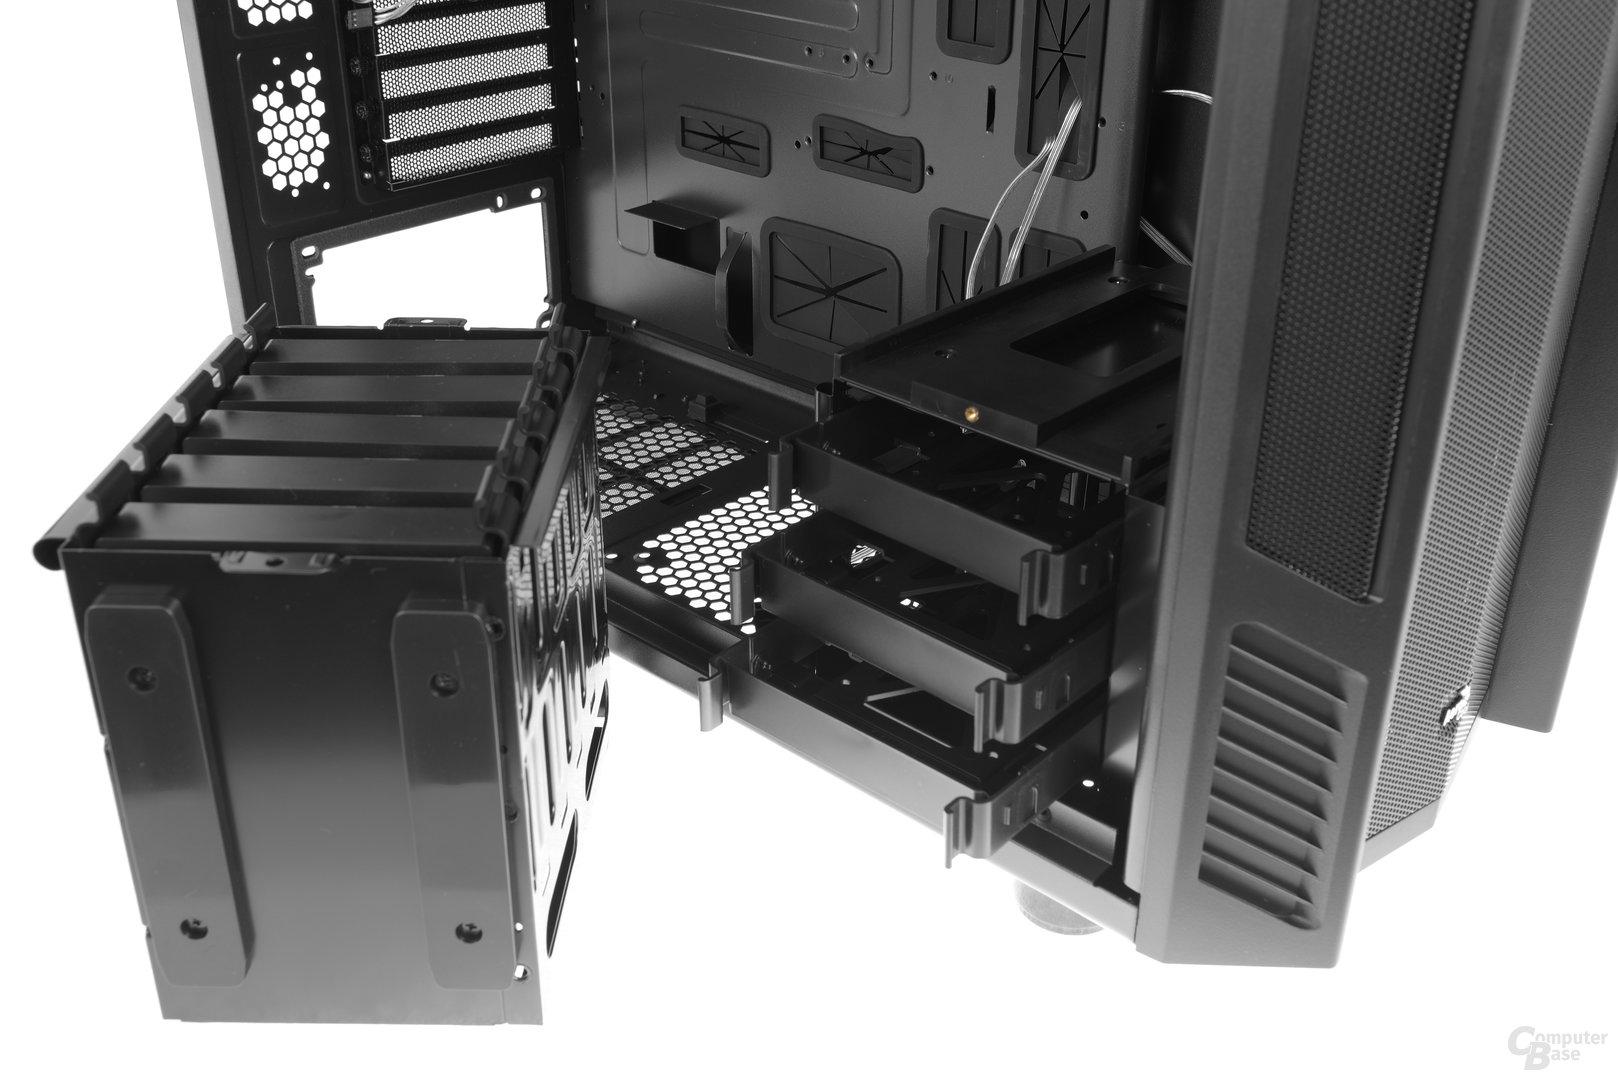 Aerocool XPredator II – Die Festplattenkäfige sind modular